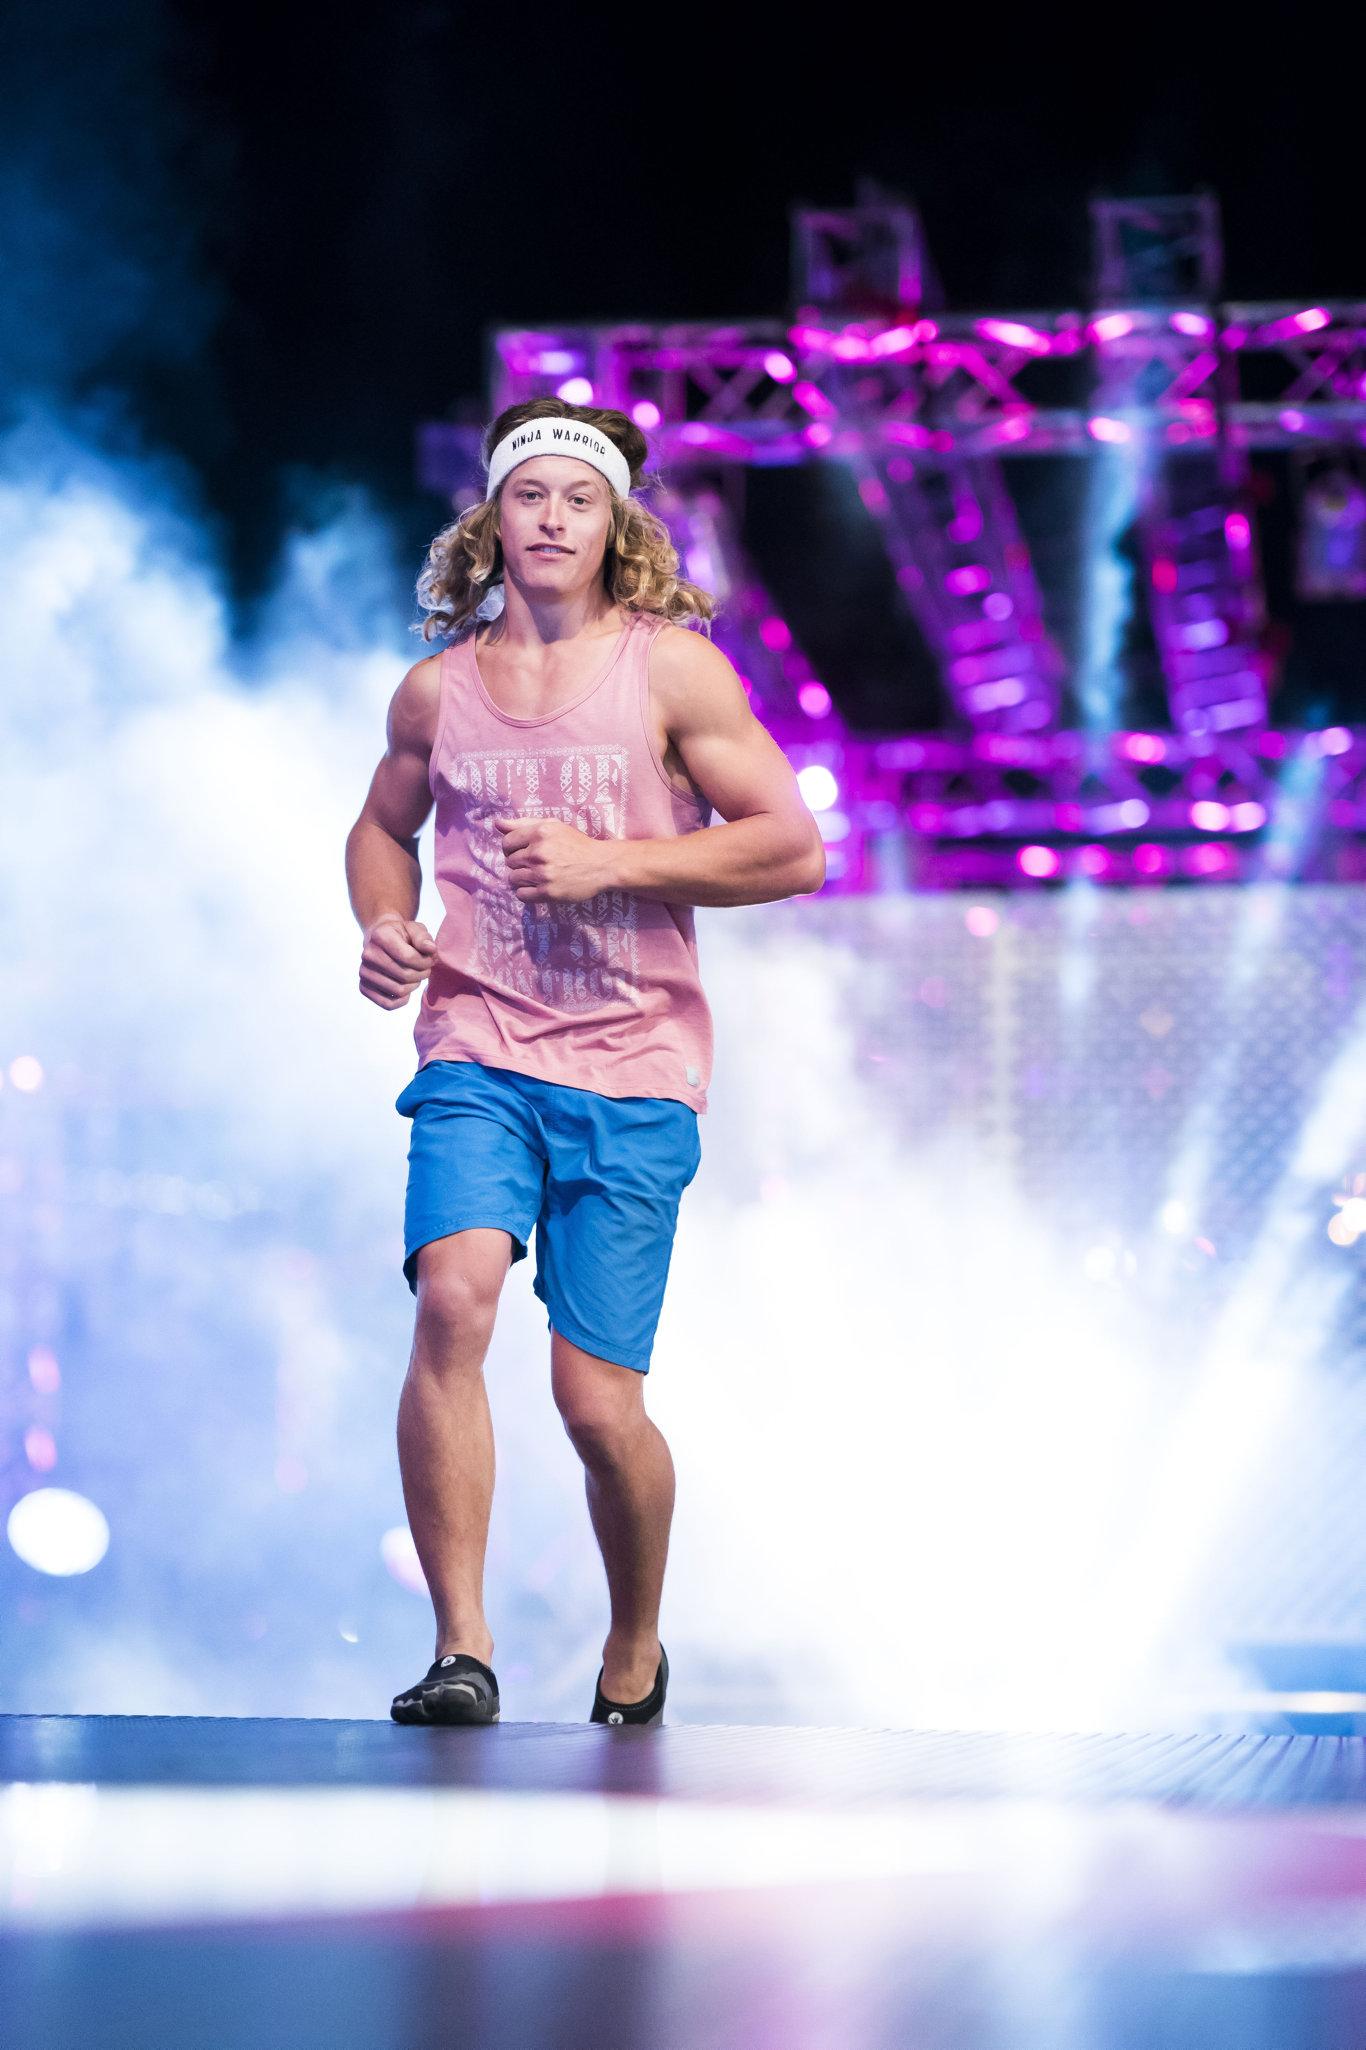 Lightning-fast ninja Ashlin Herbert is back to carve up the obstacle course in season three of Australian Ninja Warrior.